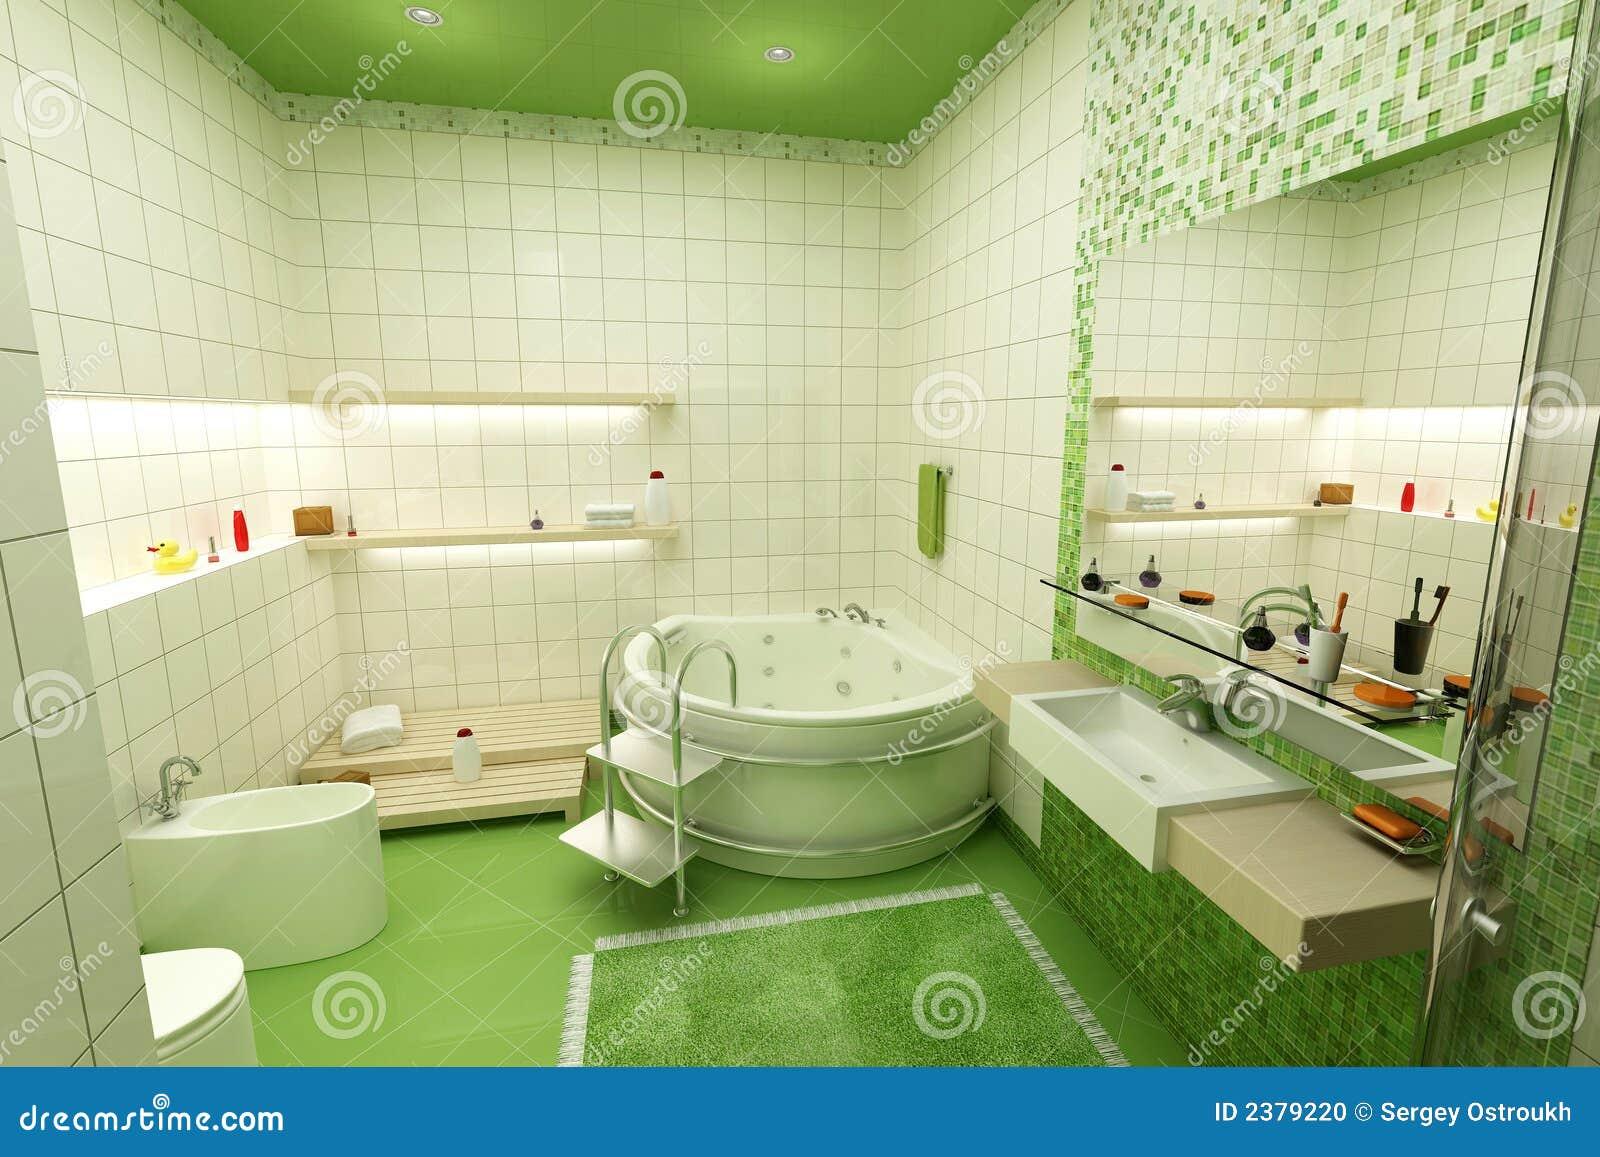 Salle de bains verte photo stock image 2379220 for Salle de bain verte